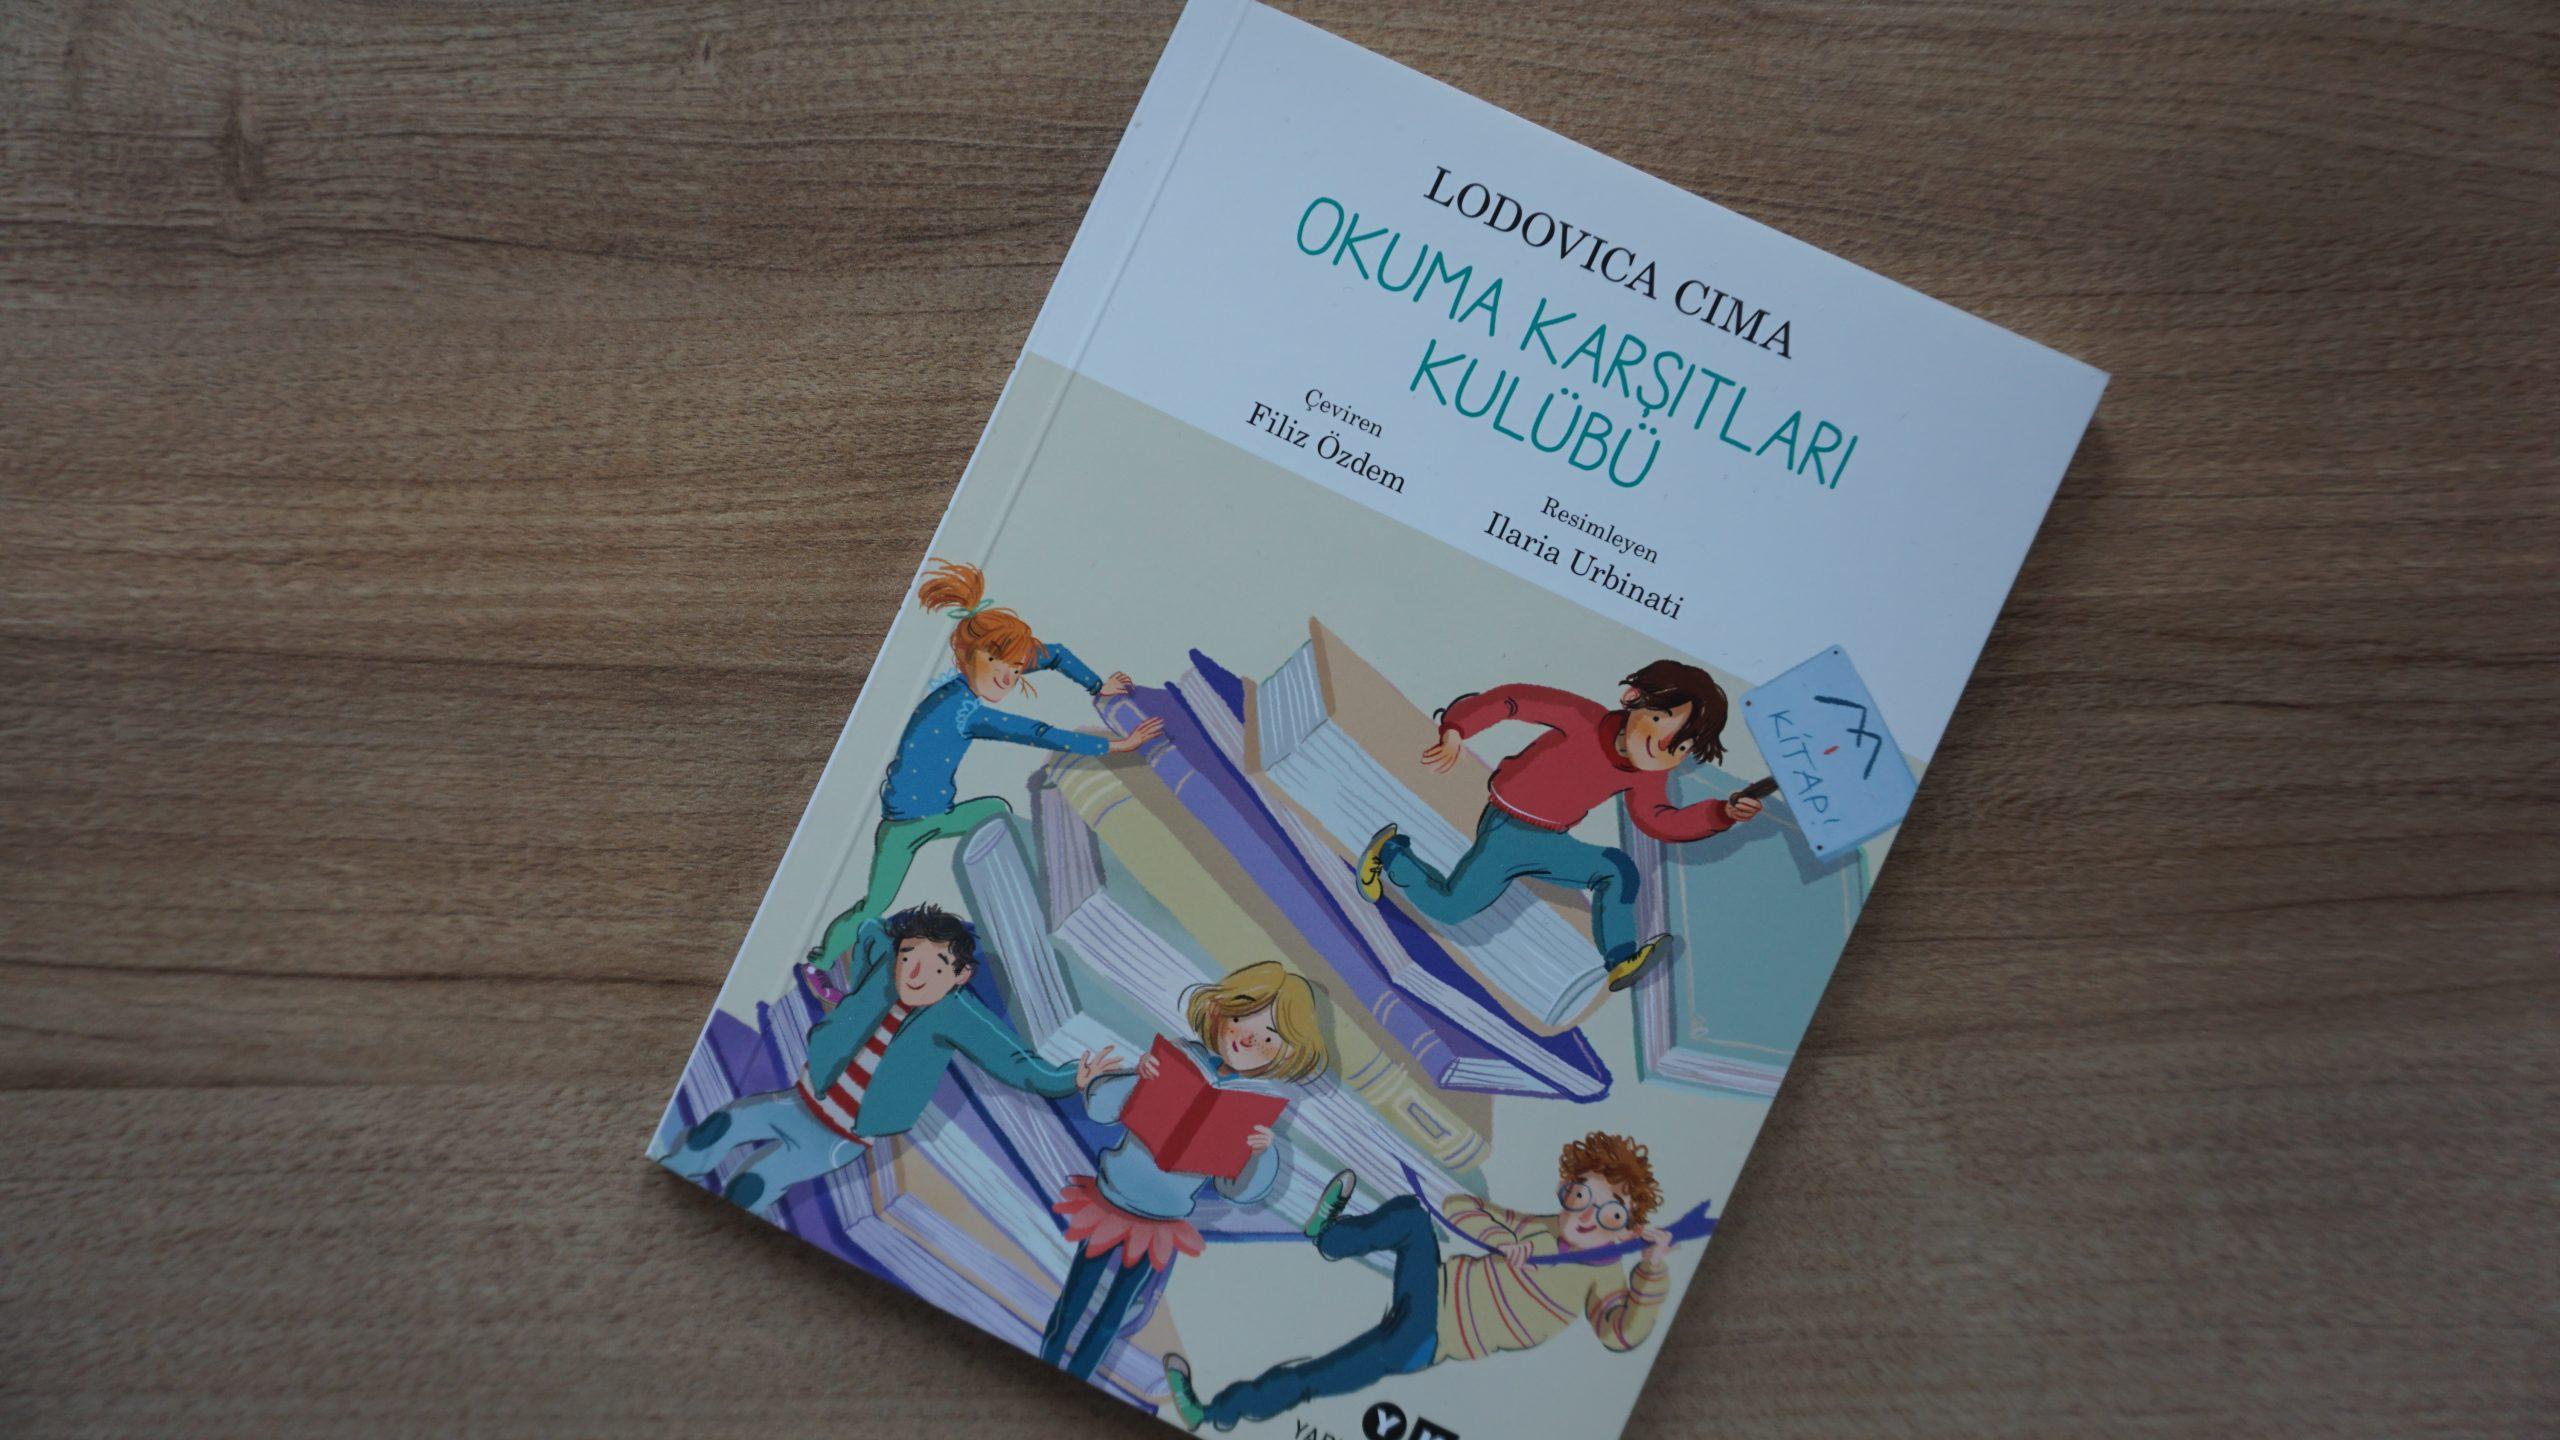 Okuma Karşıtları Klübü